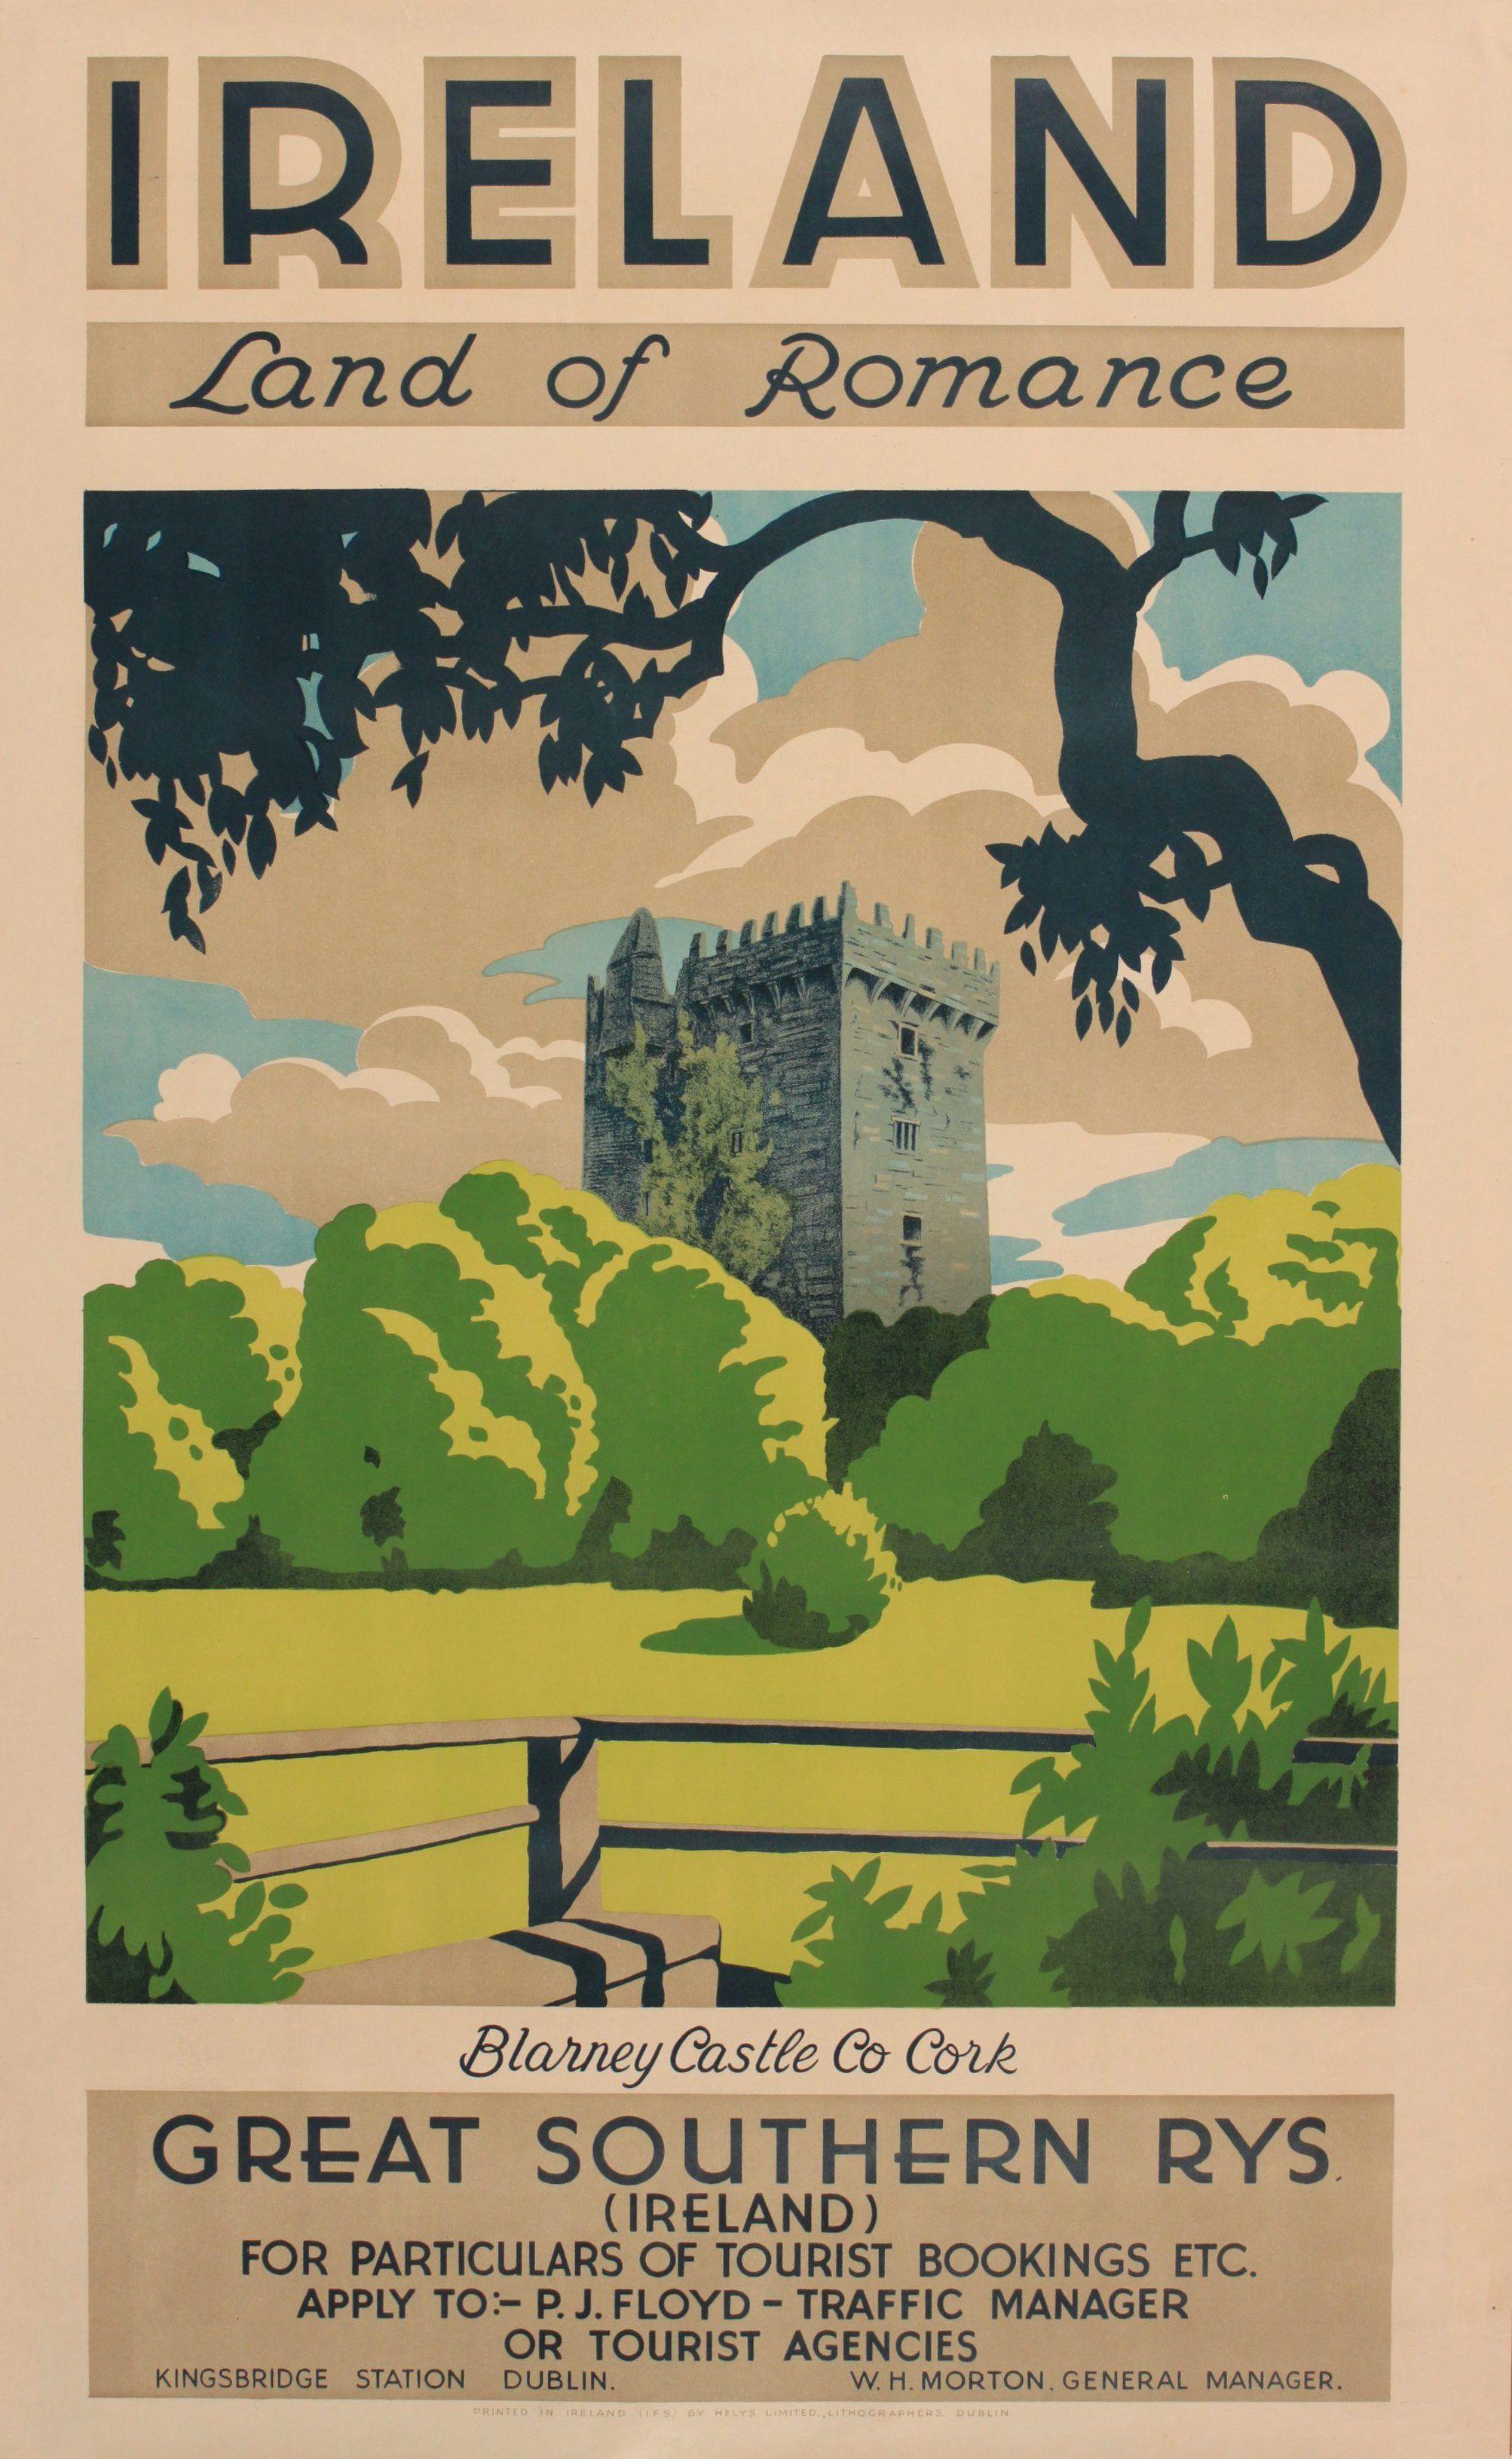 20th Century Ireland Travel Poster Google Search Travel Posters Vintage Travel Travel Postcard